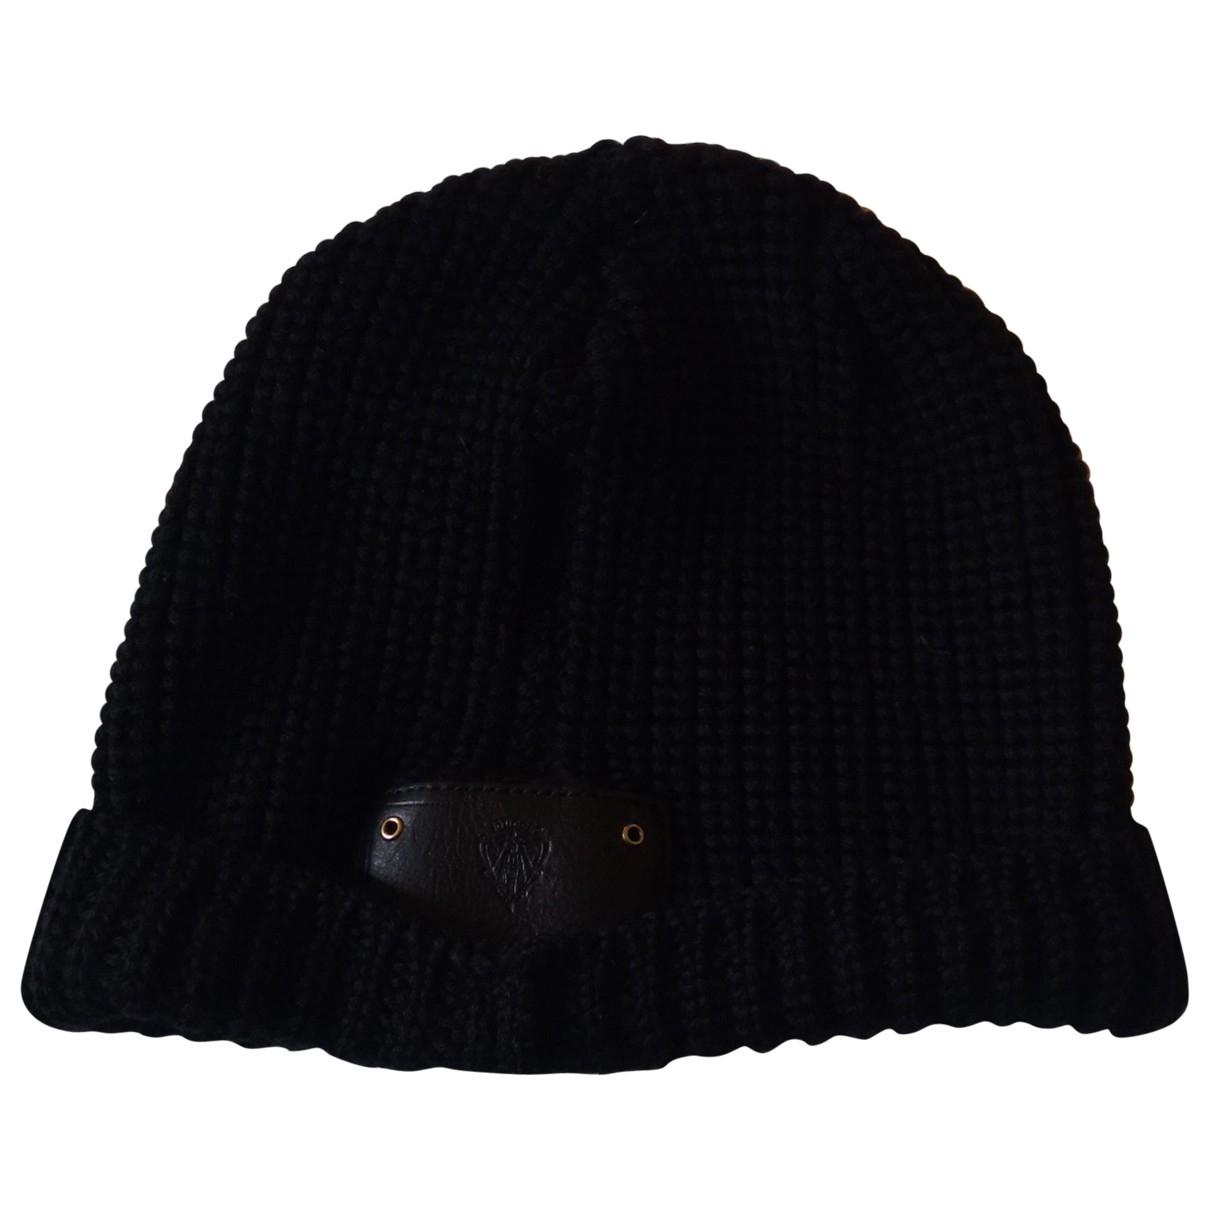 Gucci \N Blue Wool hat for Women M International